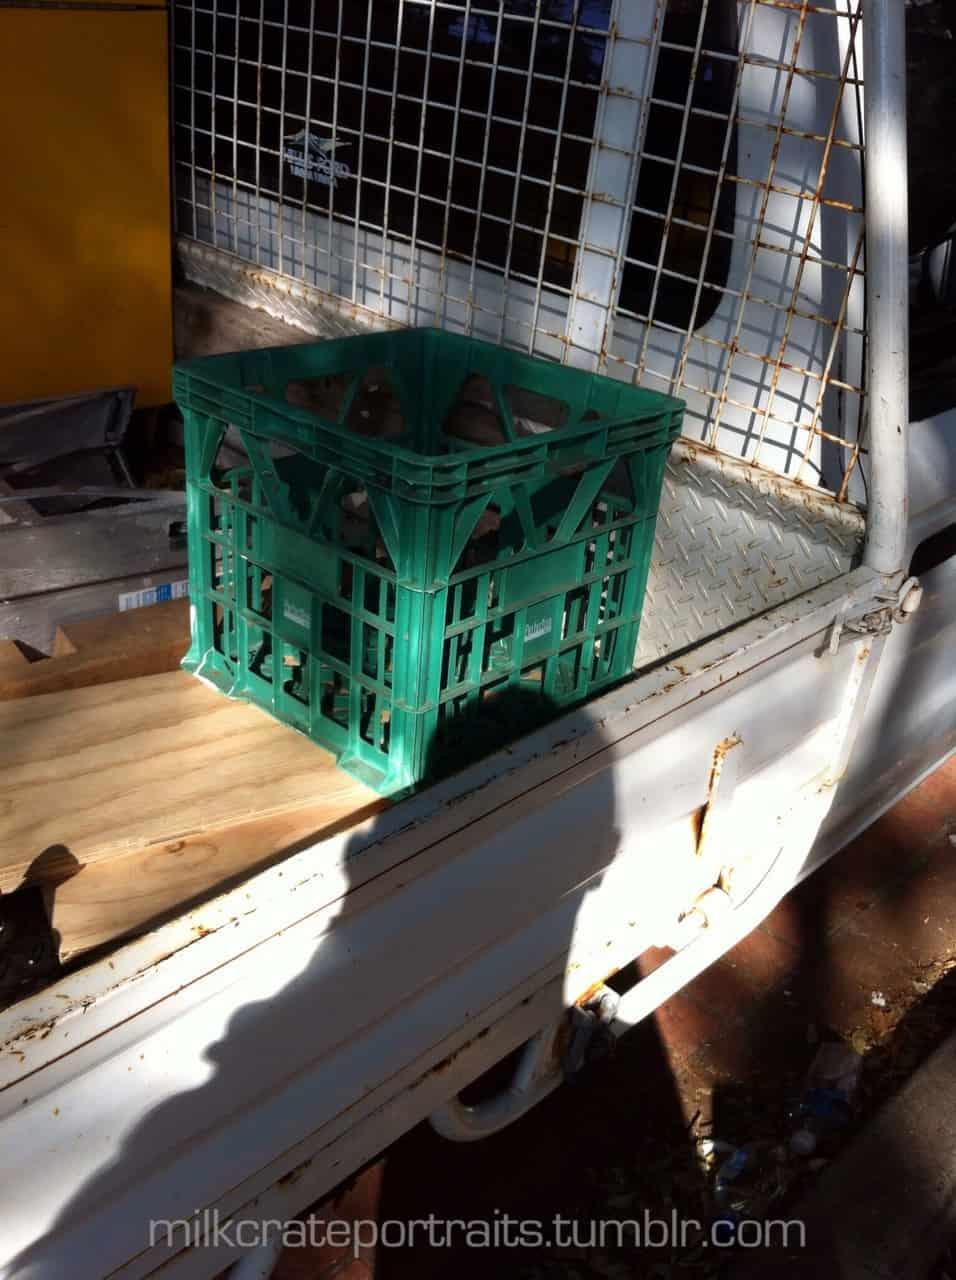 Tradie's crates